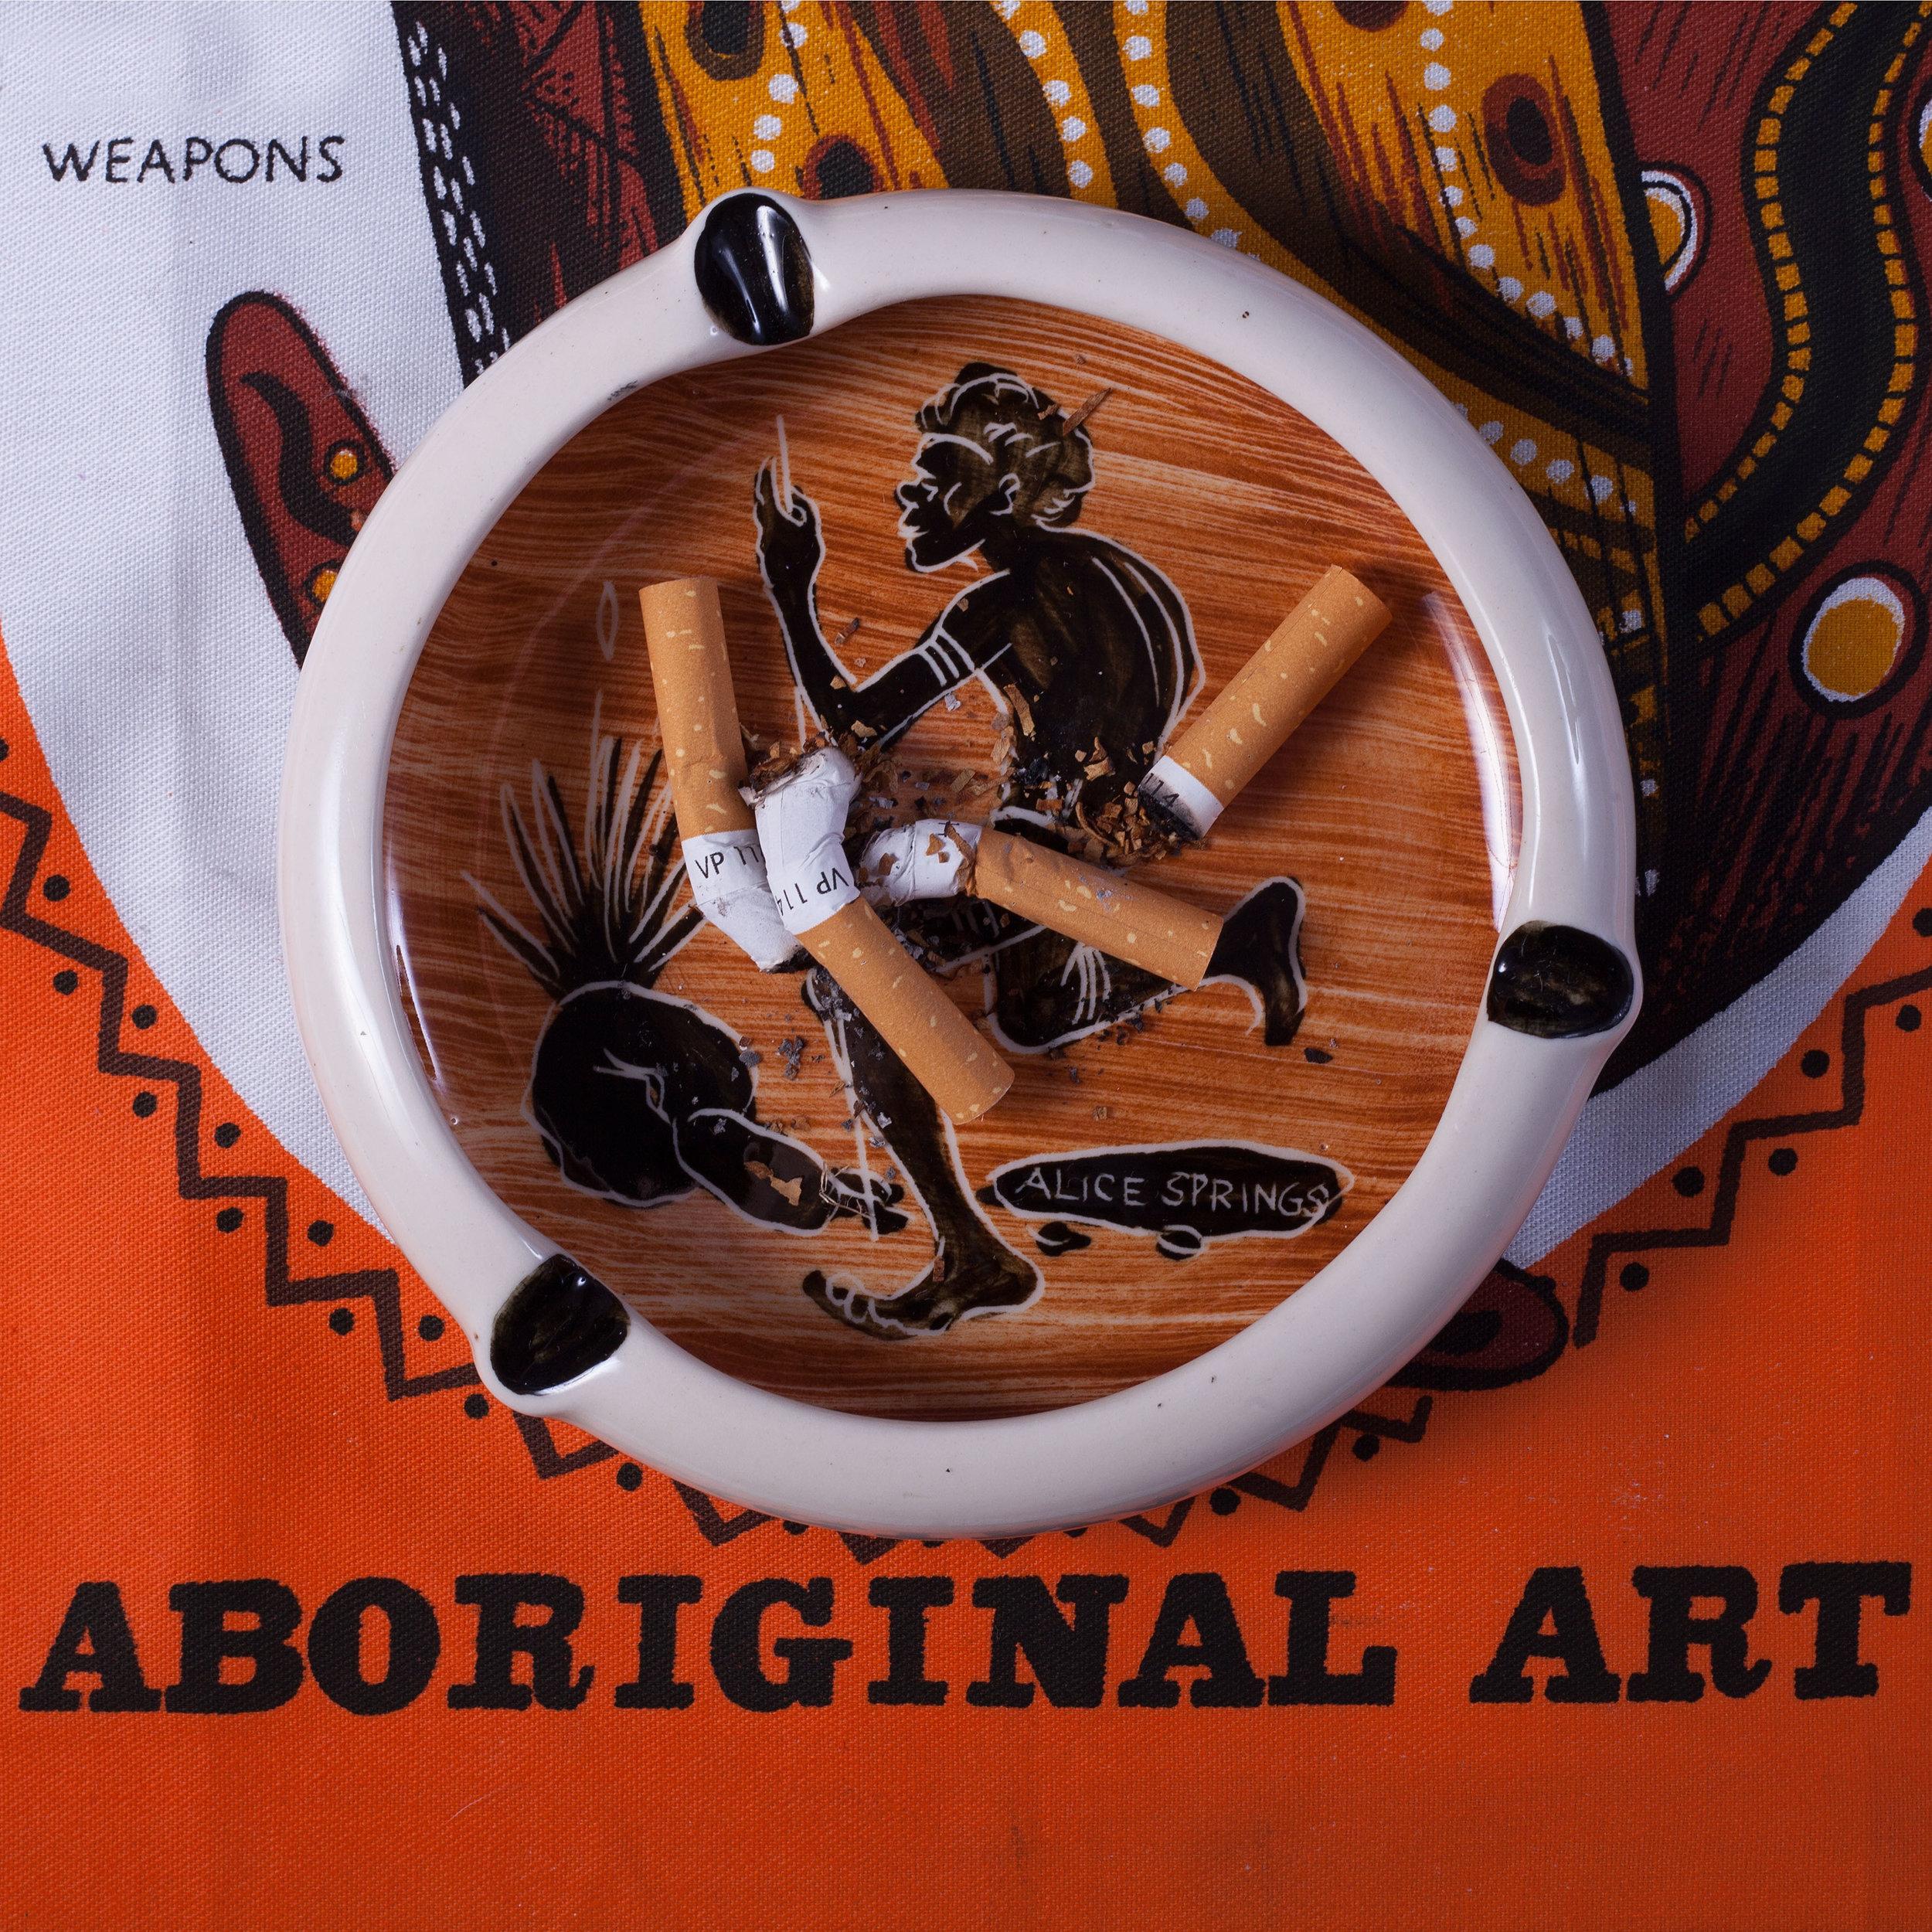 Tony Albert  Mid Century Modern - Aboriginal Art  2016 Pigment print on paper, 120 x 120cm edition of 3 + 2AP  Image credit: courtesy of the artist and Sullivan + Strumpf